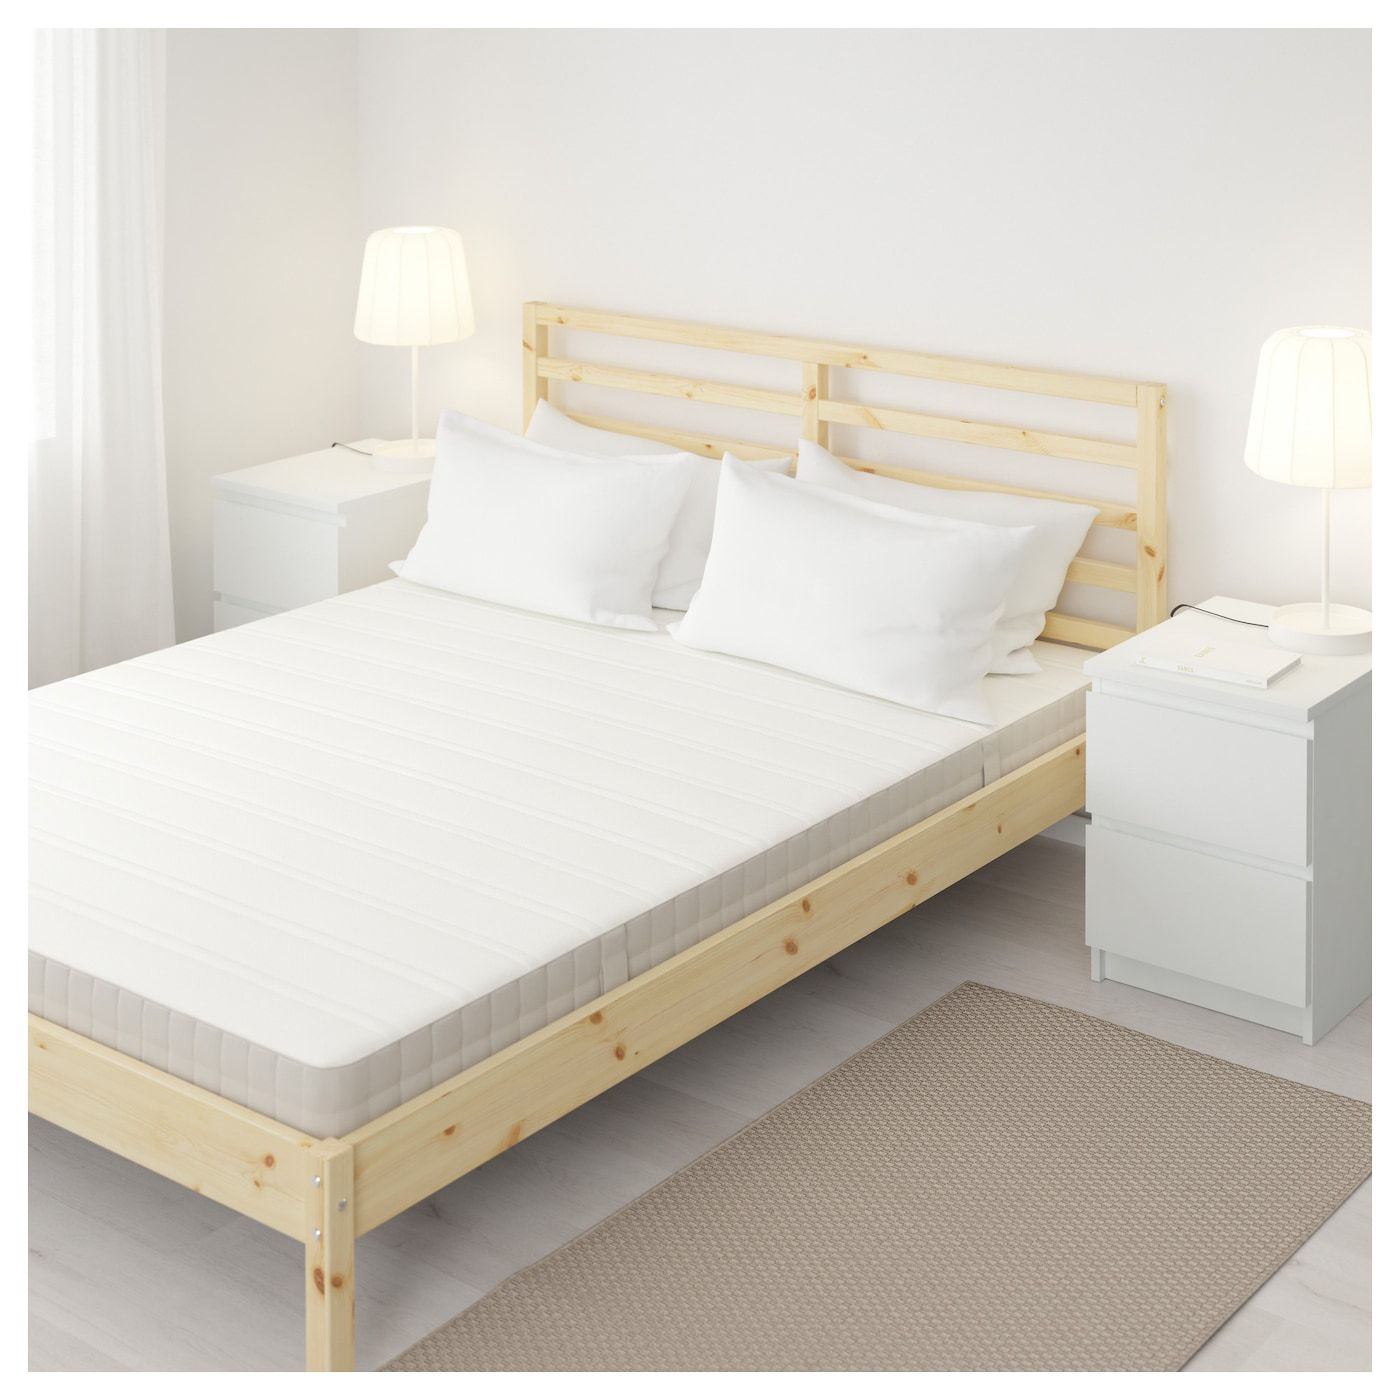 Ikea Hasvag Spring Mattress Malm Bed Frame Mattress Bed Frame